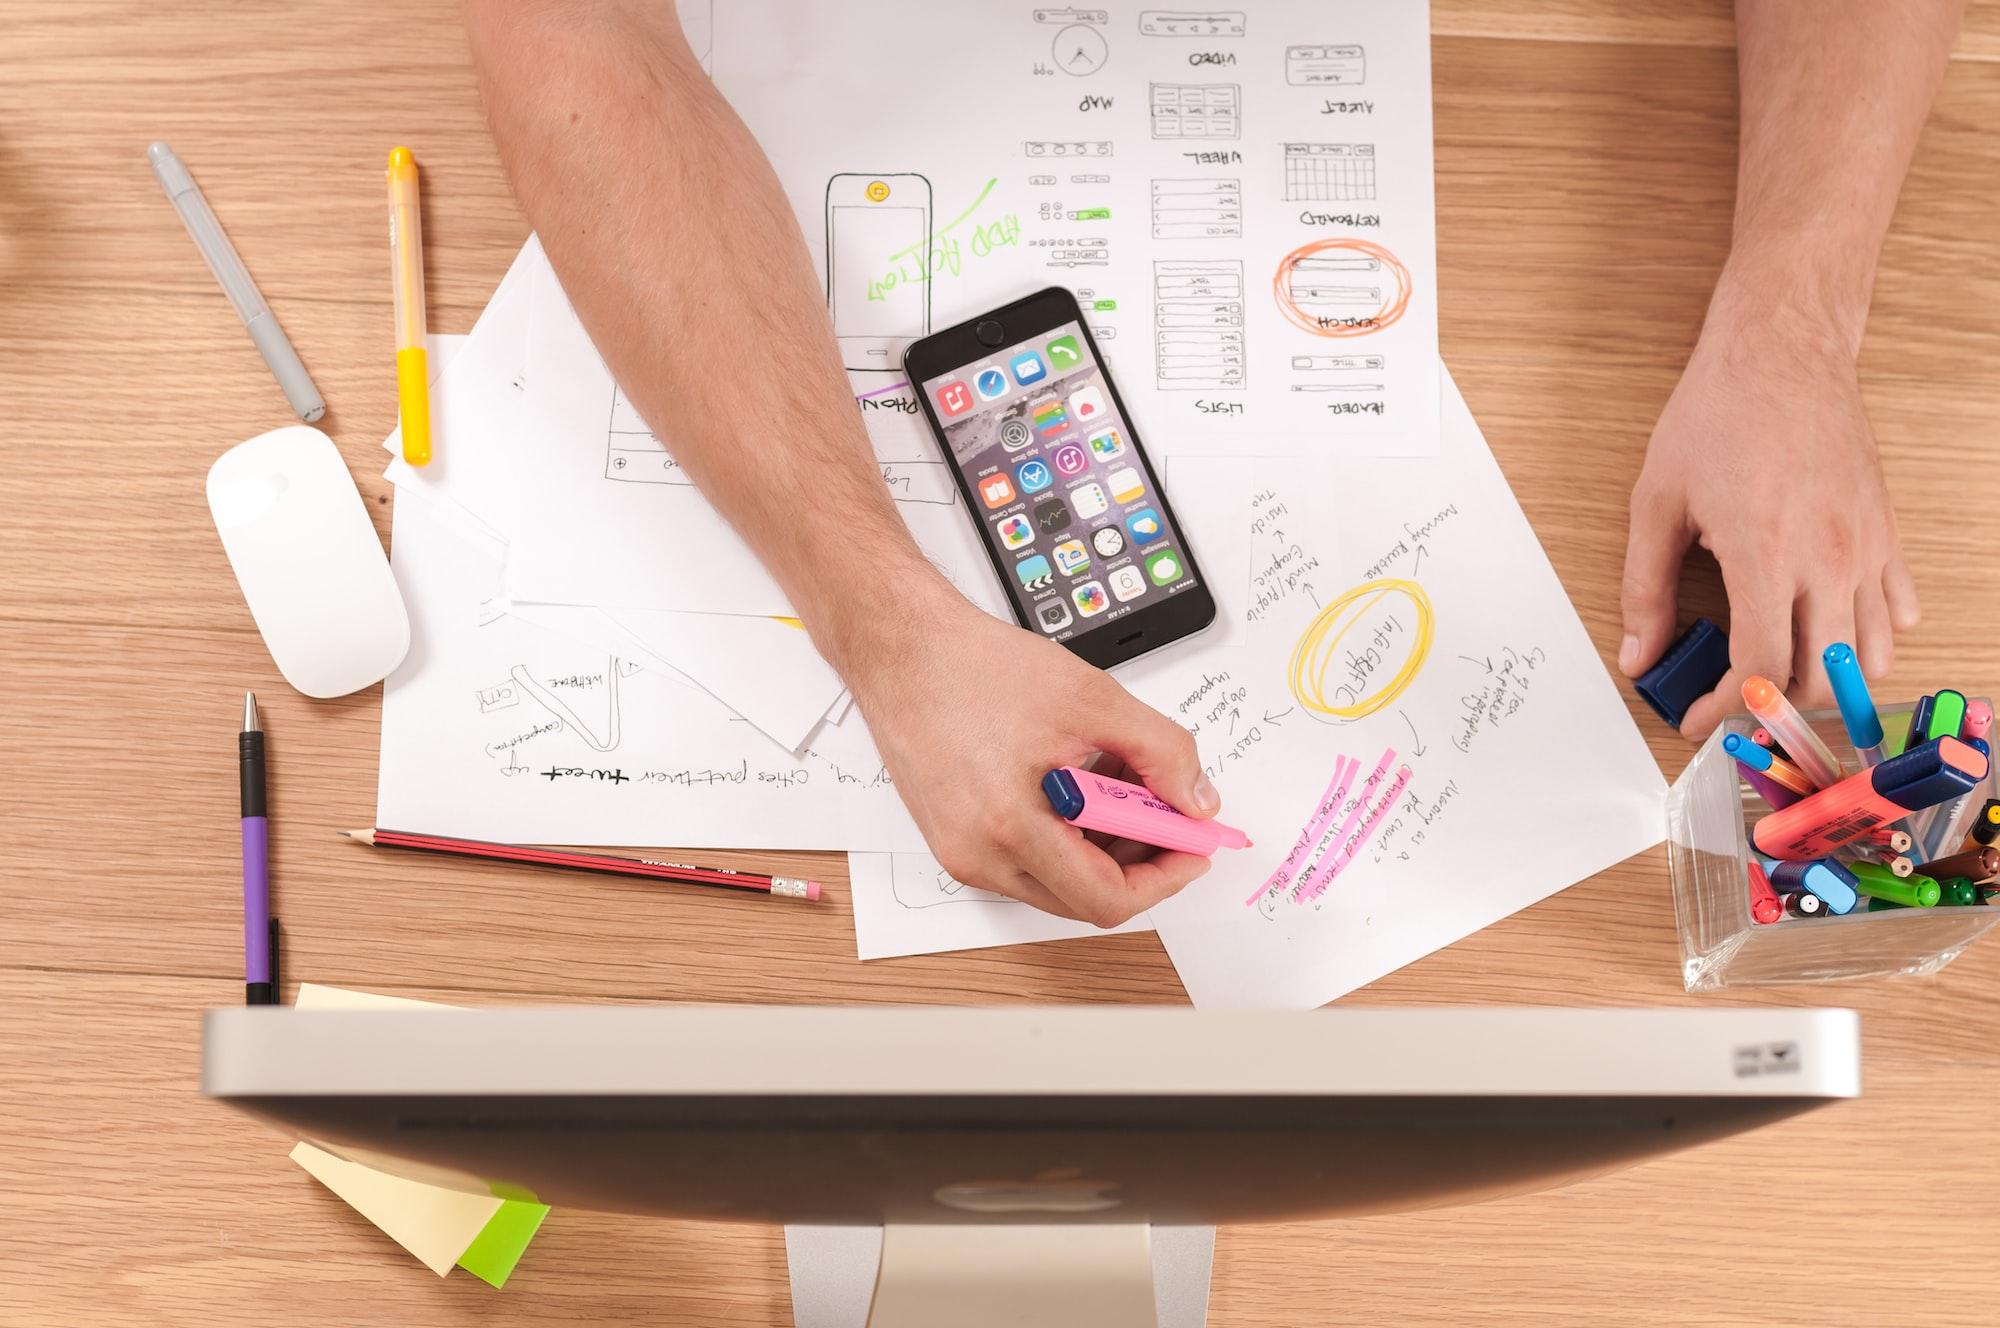 Product-led VS sales-led VS marketing-led VS customer-led: What's the difference?